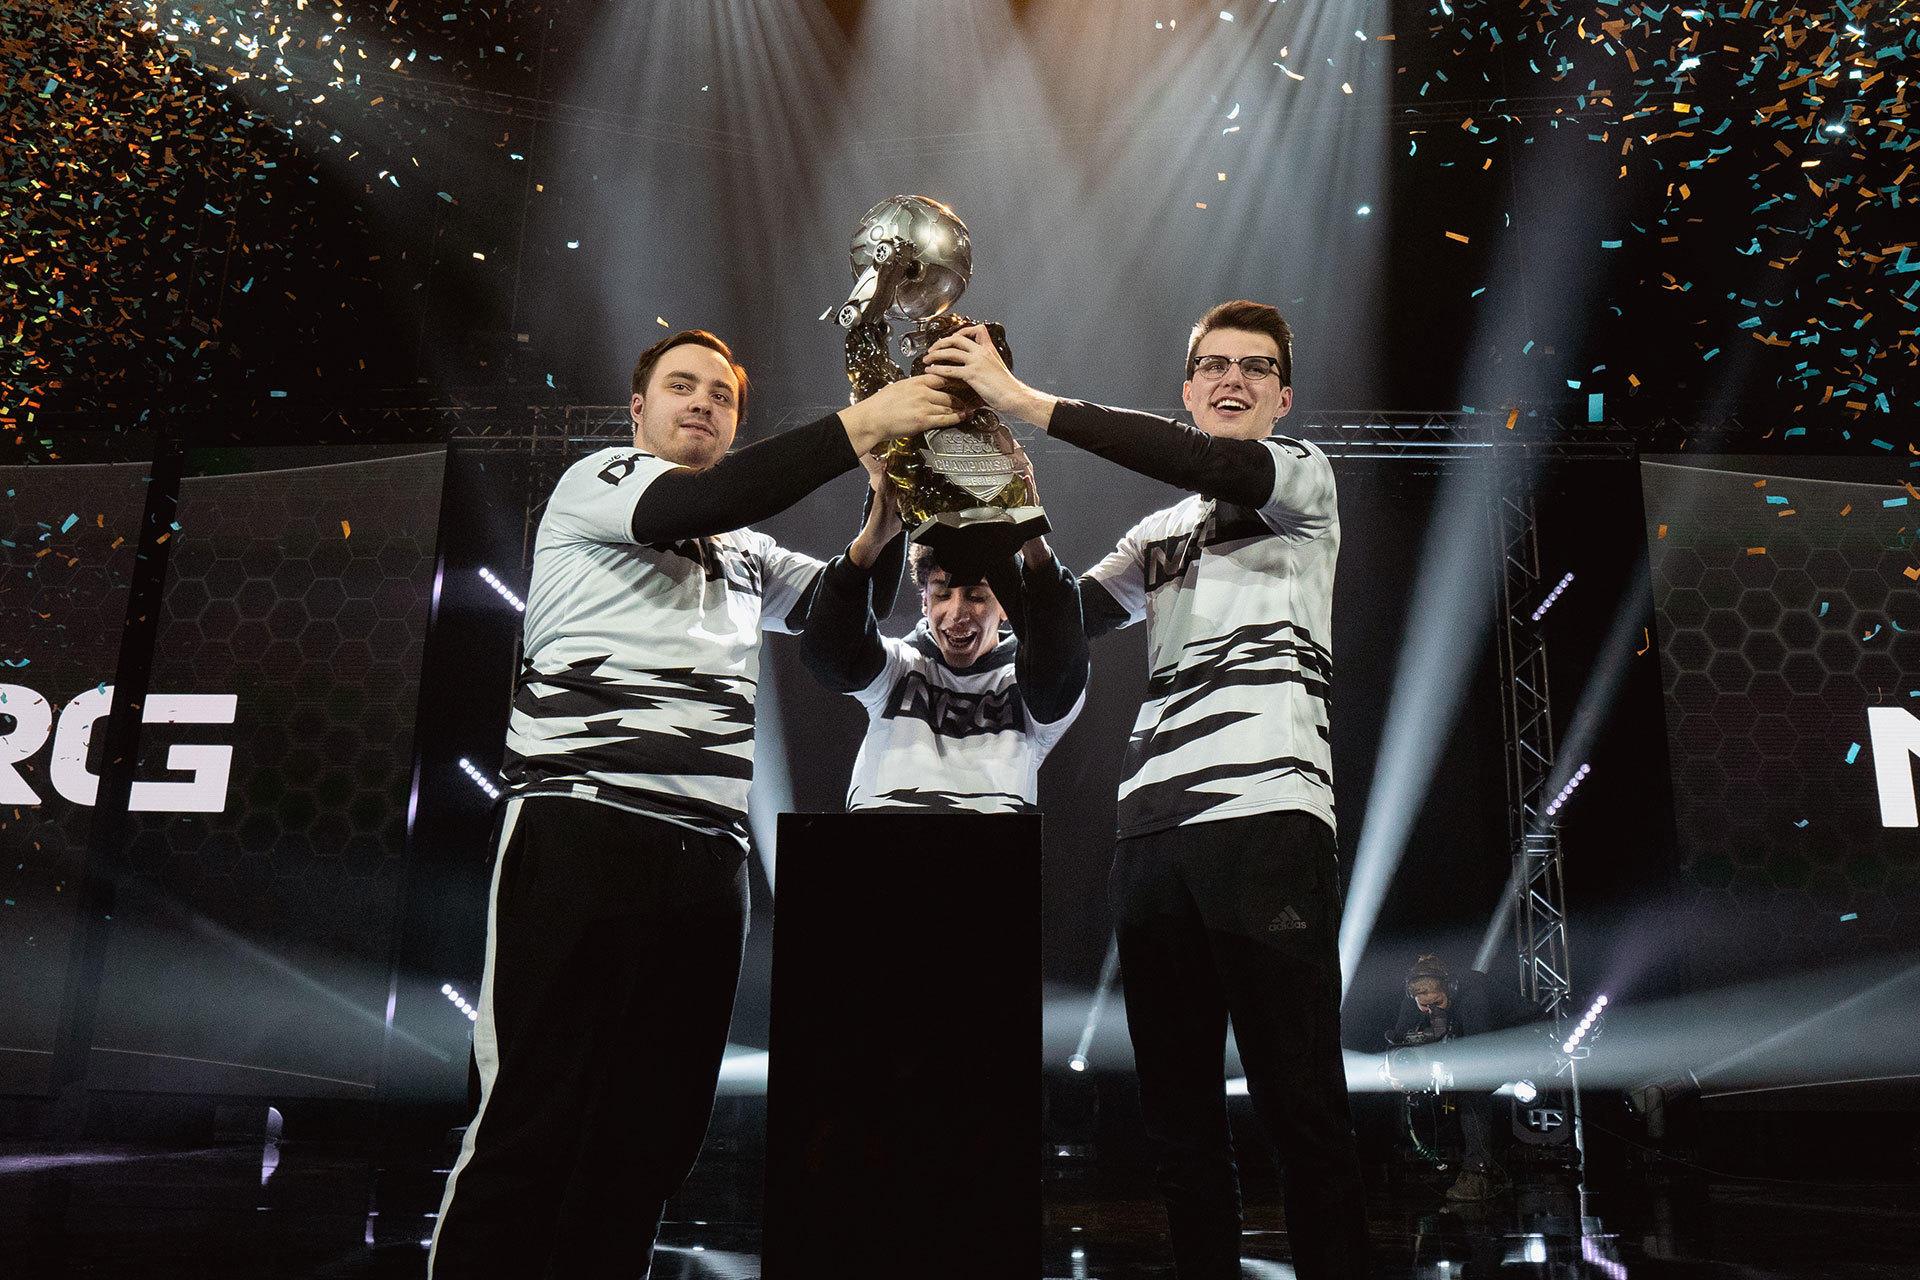 Presenting Your Season 8 World Champions Image